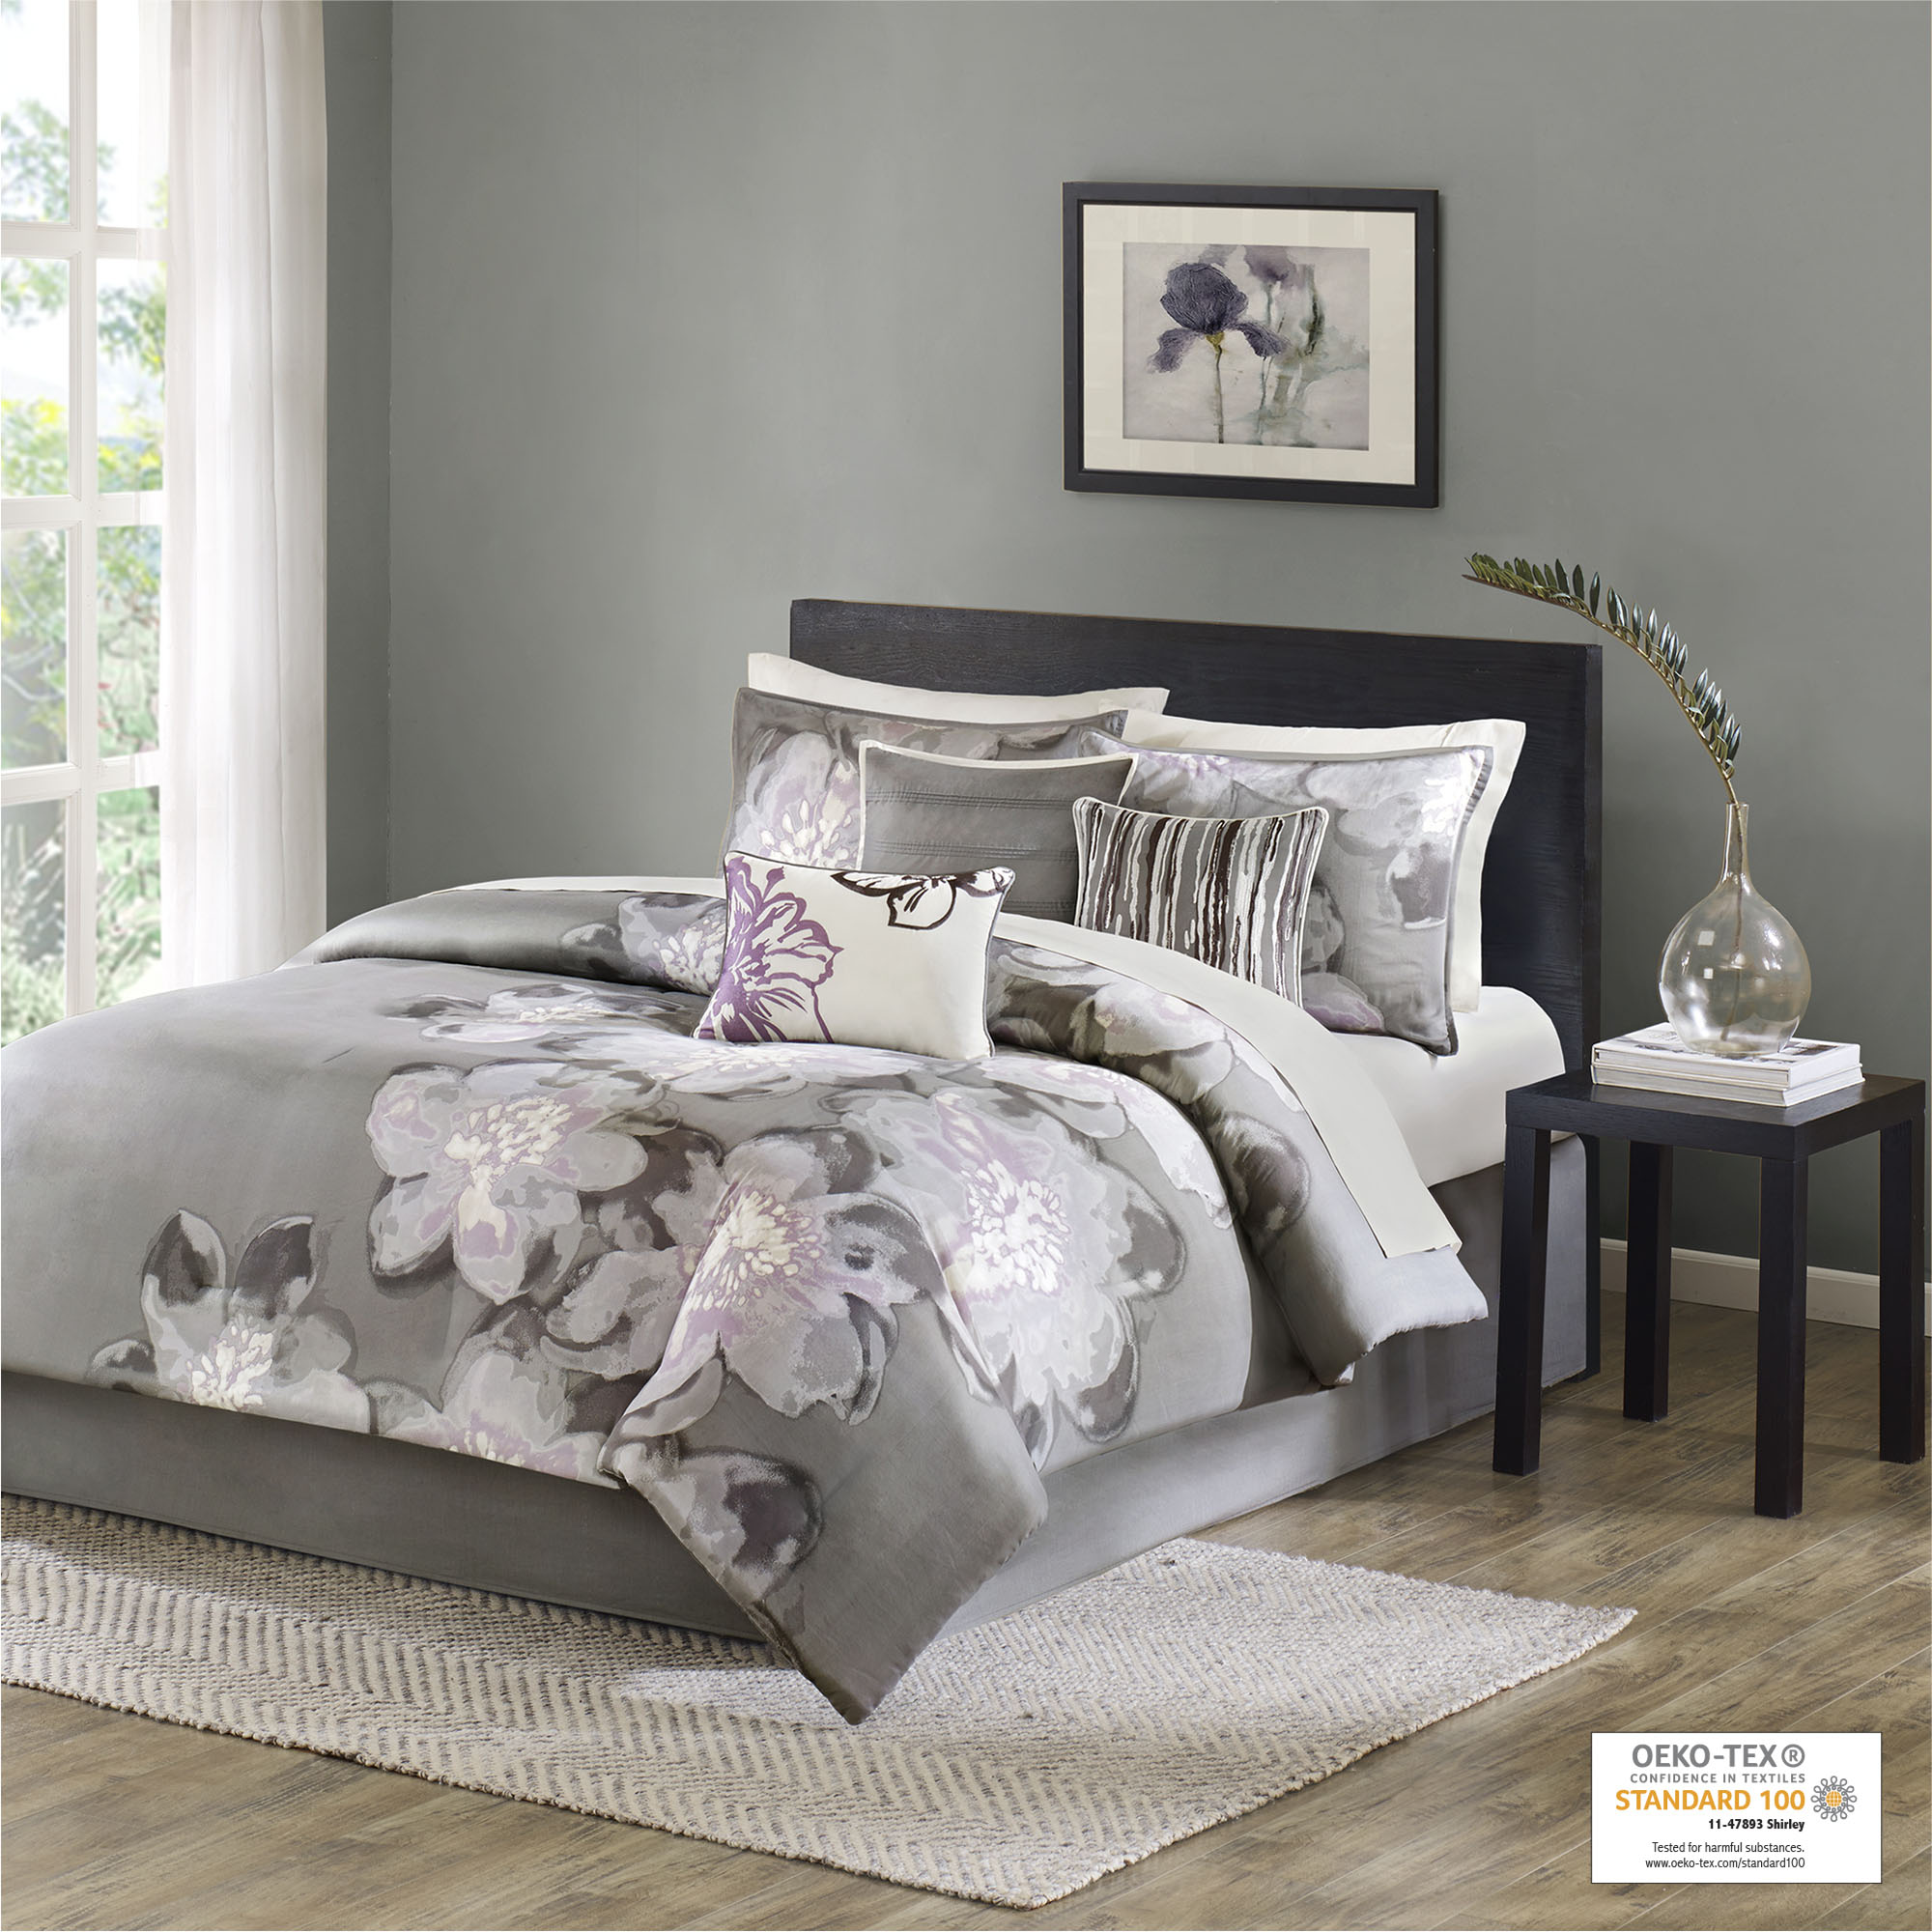 Jasmin Floral Aqua Gray Comforter Reversible Sheet Set New Girls Home Bedding